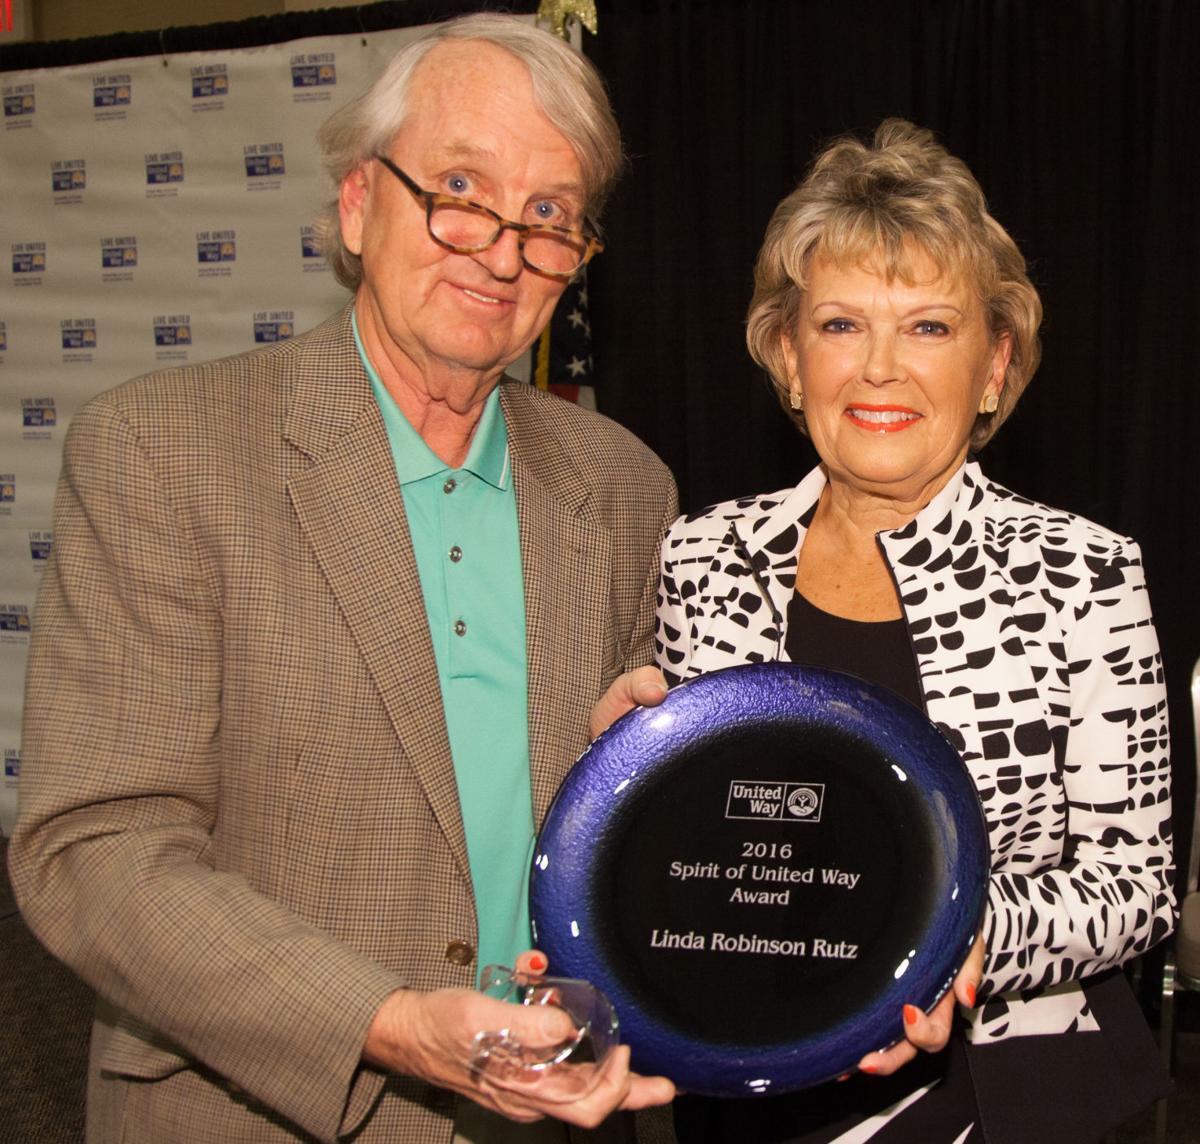 Nick Cusick presents Linda Robinson Rutz with Spirit of United Way award